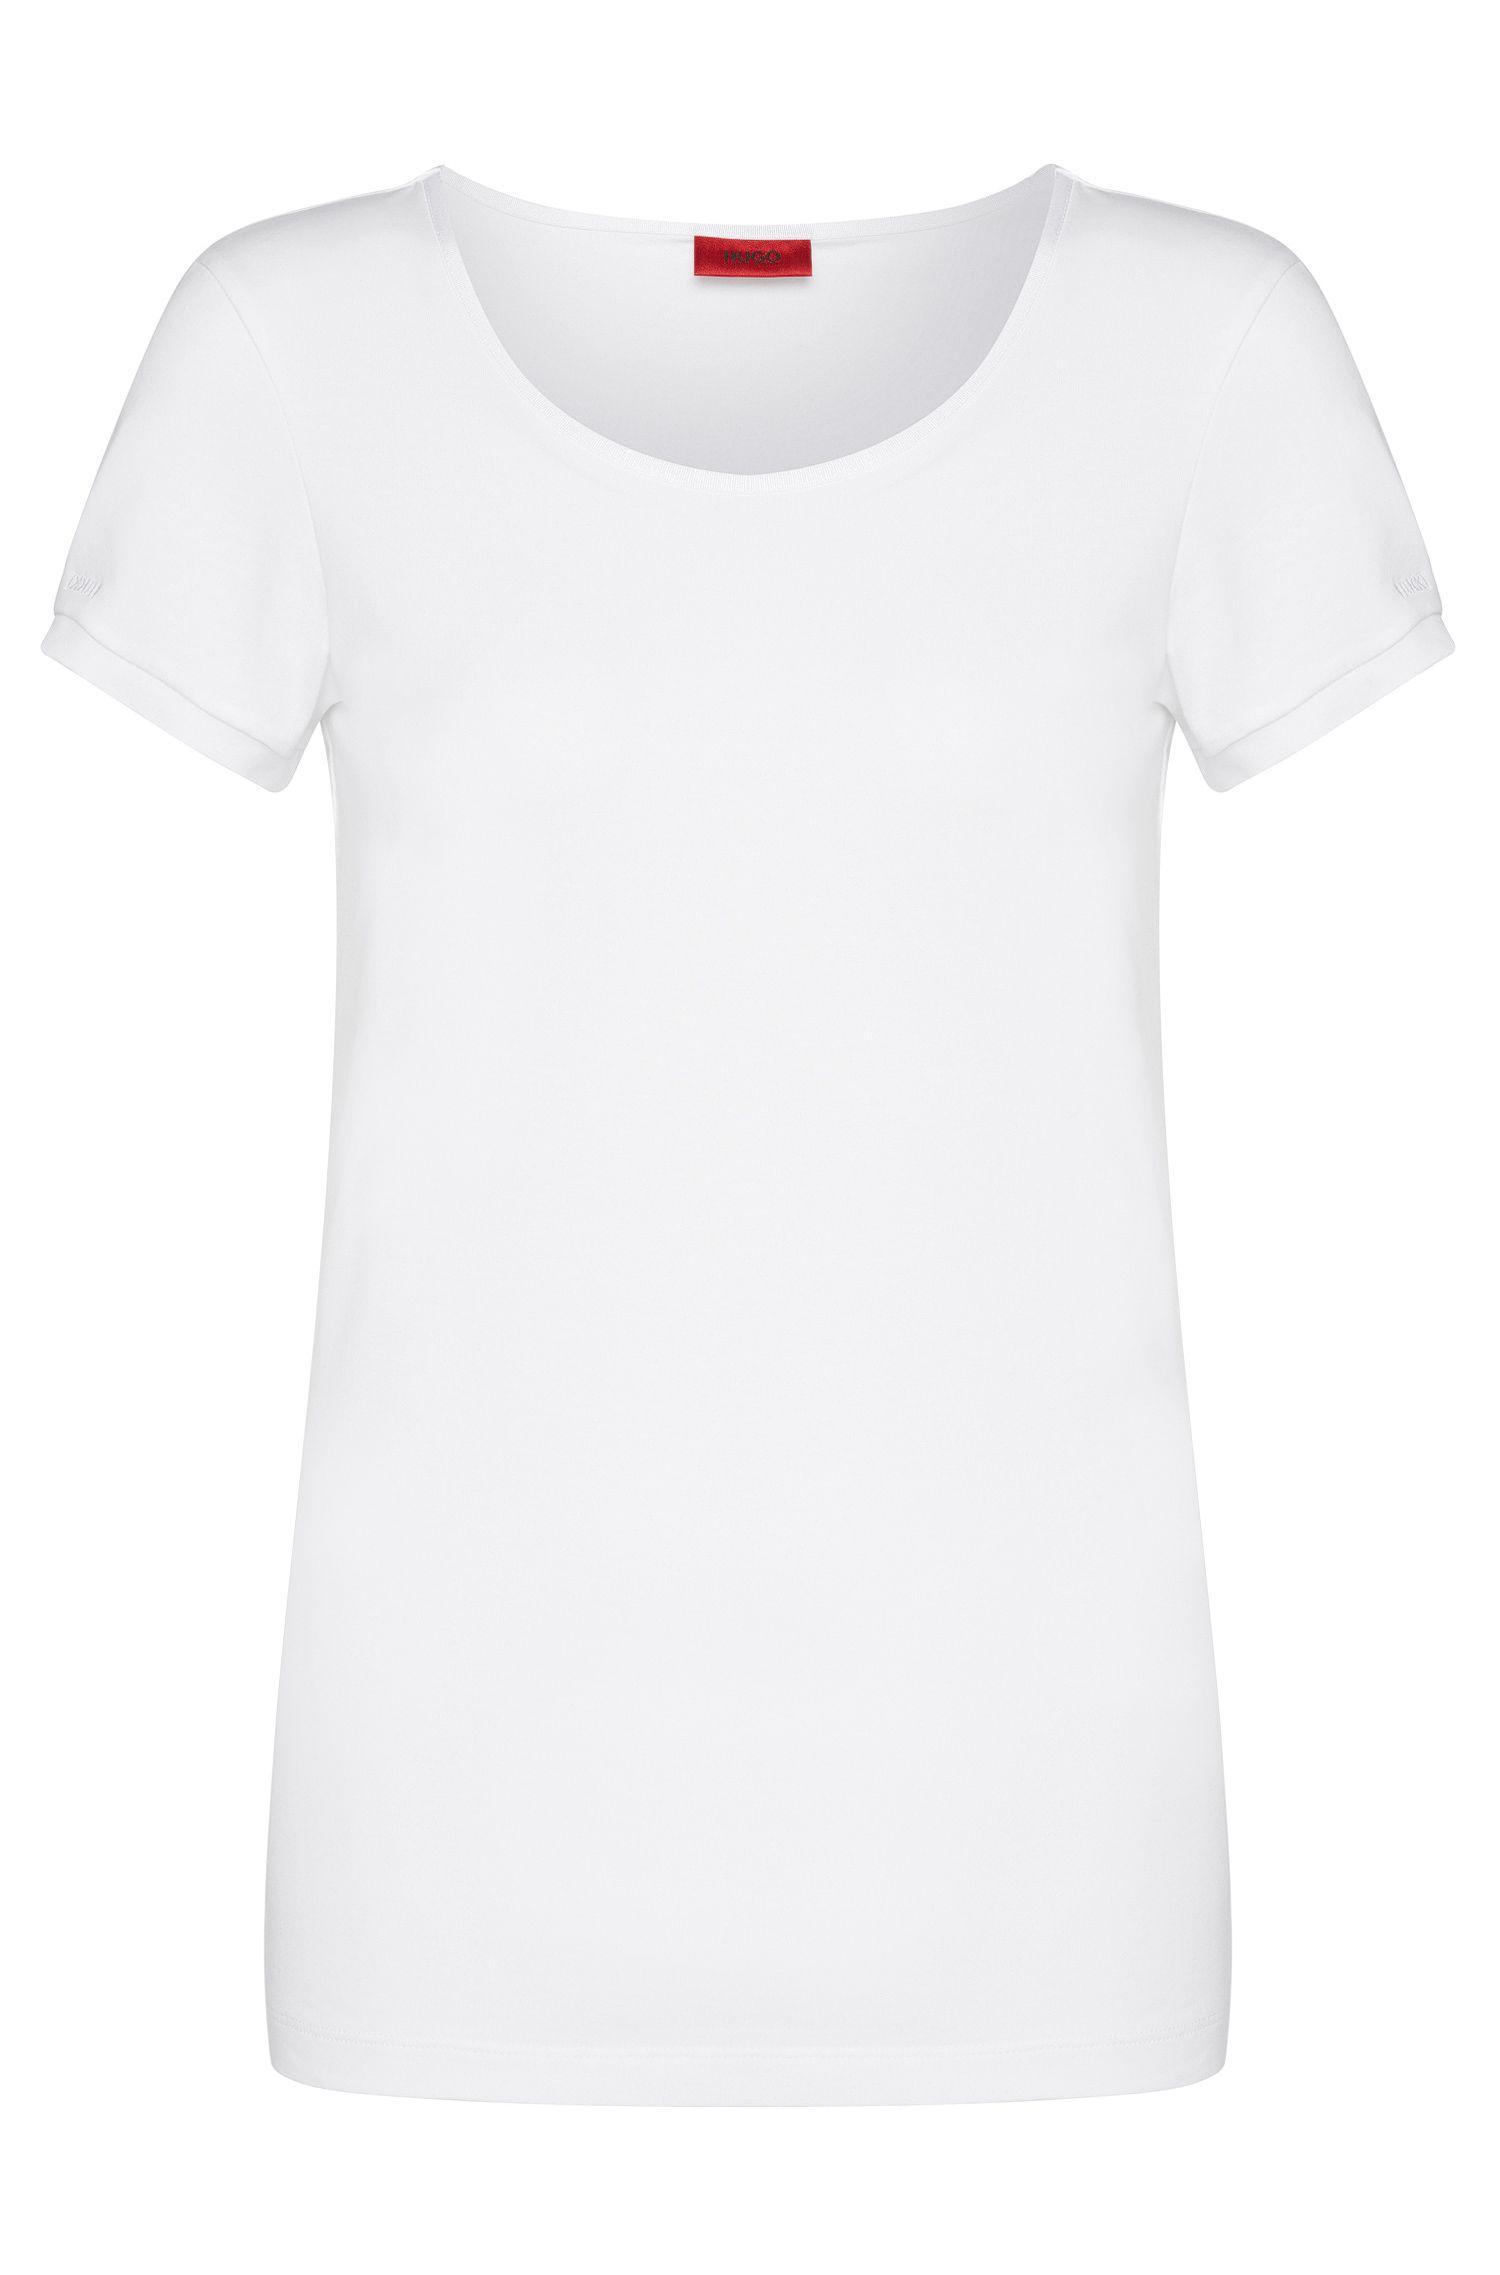 Slim fit t-shirt in stretch cotton: 'Debana'